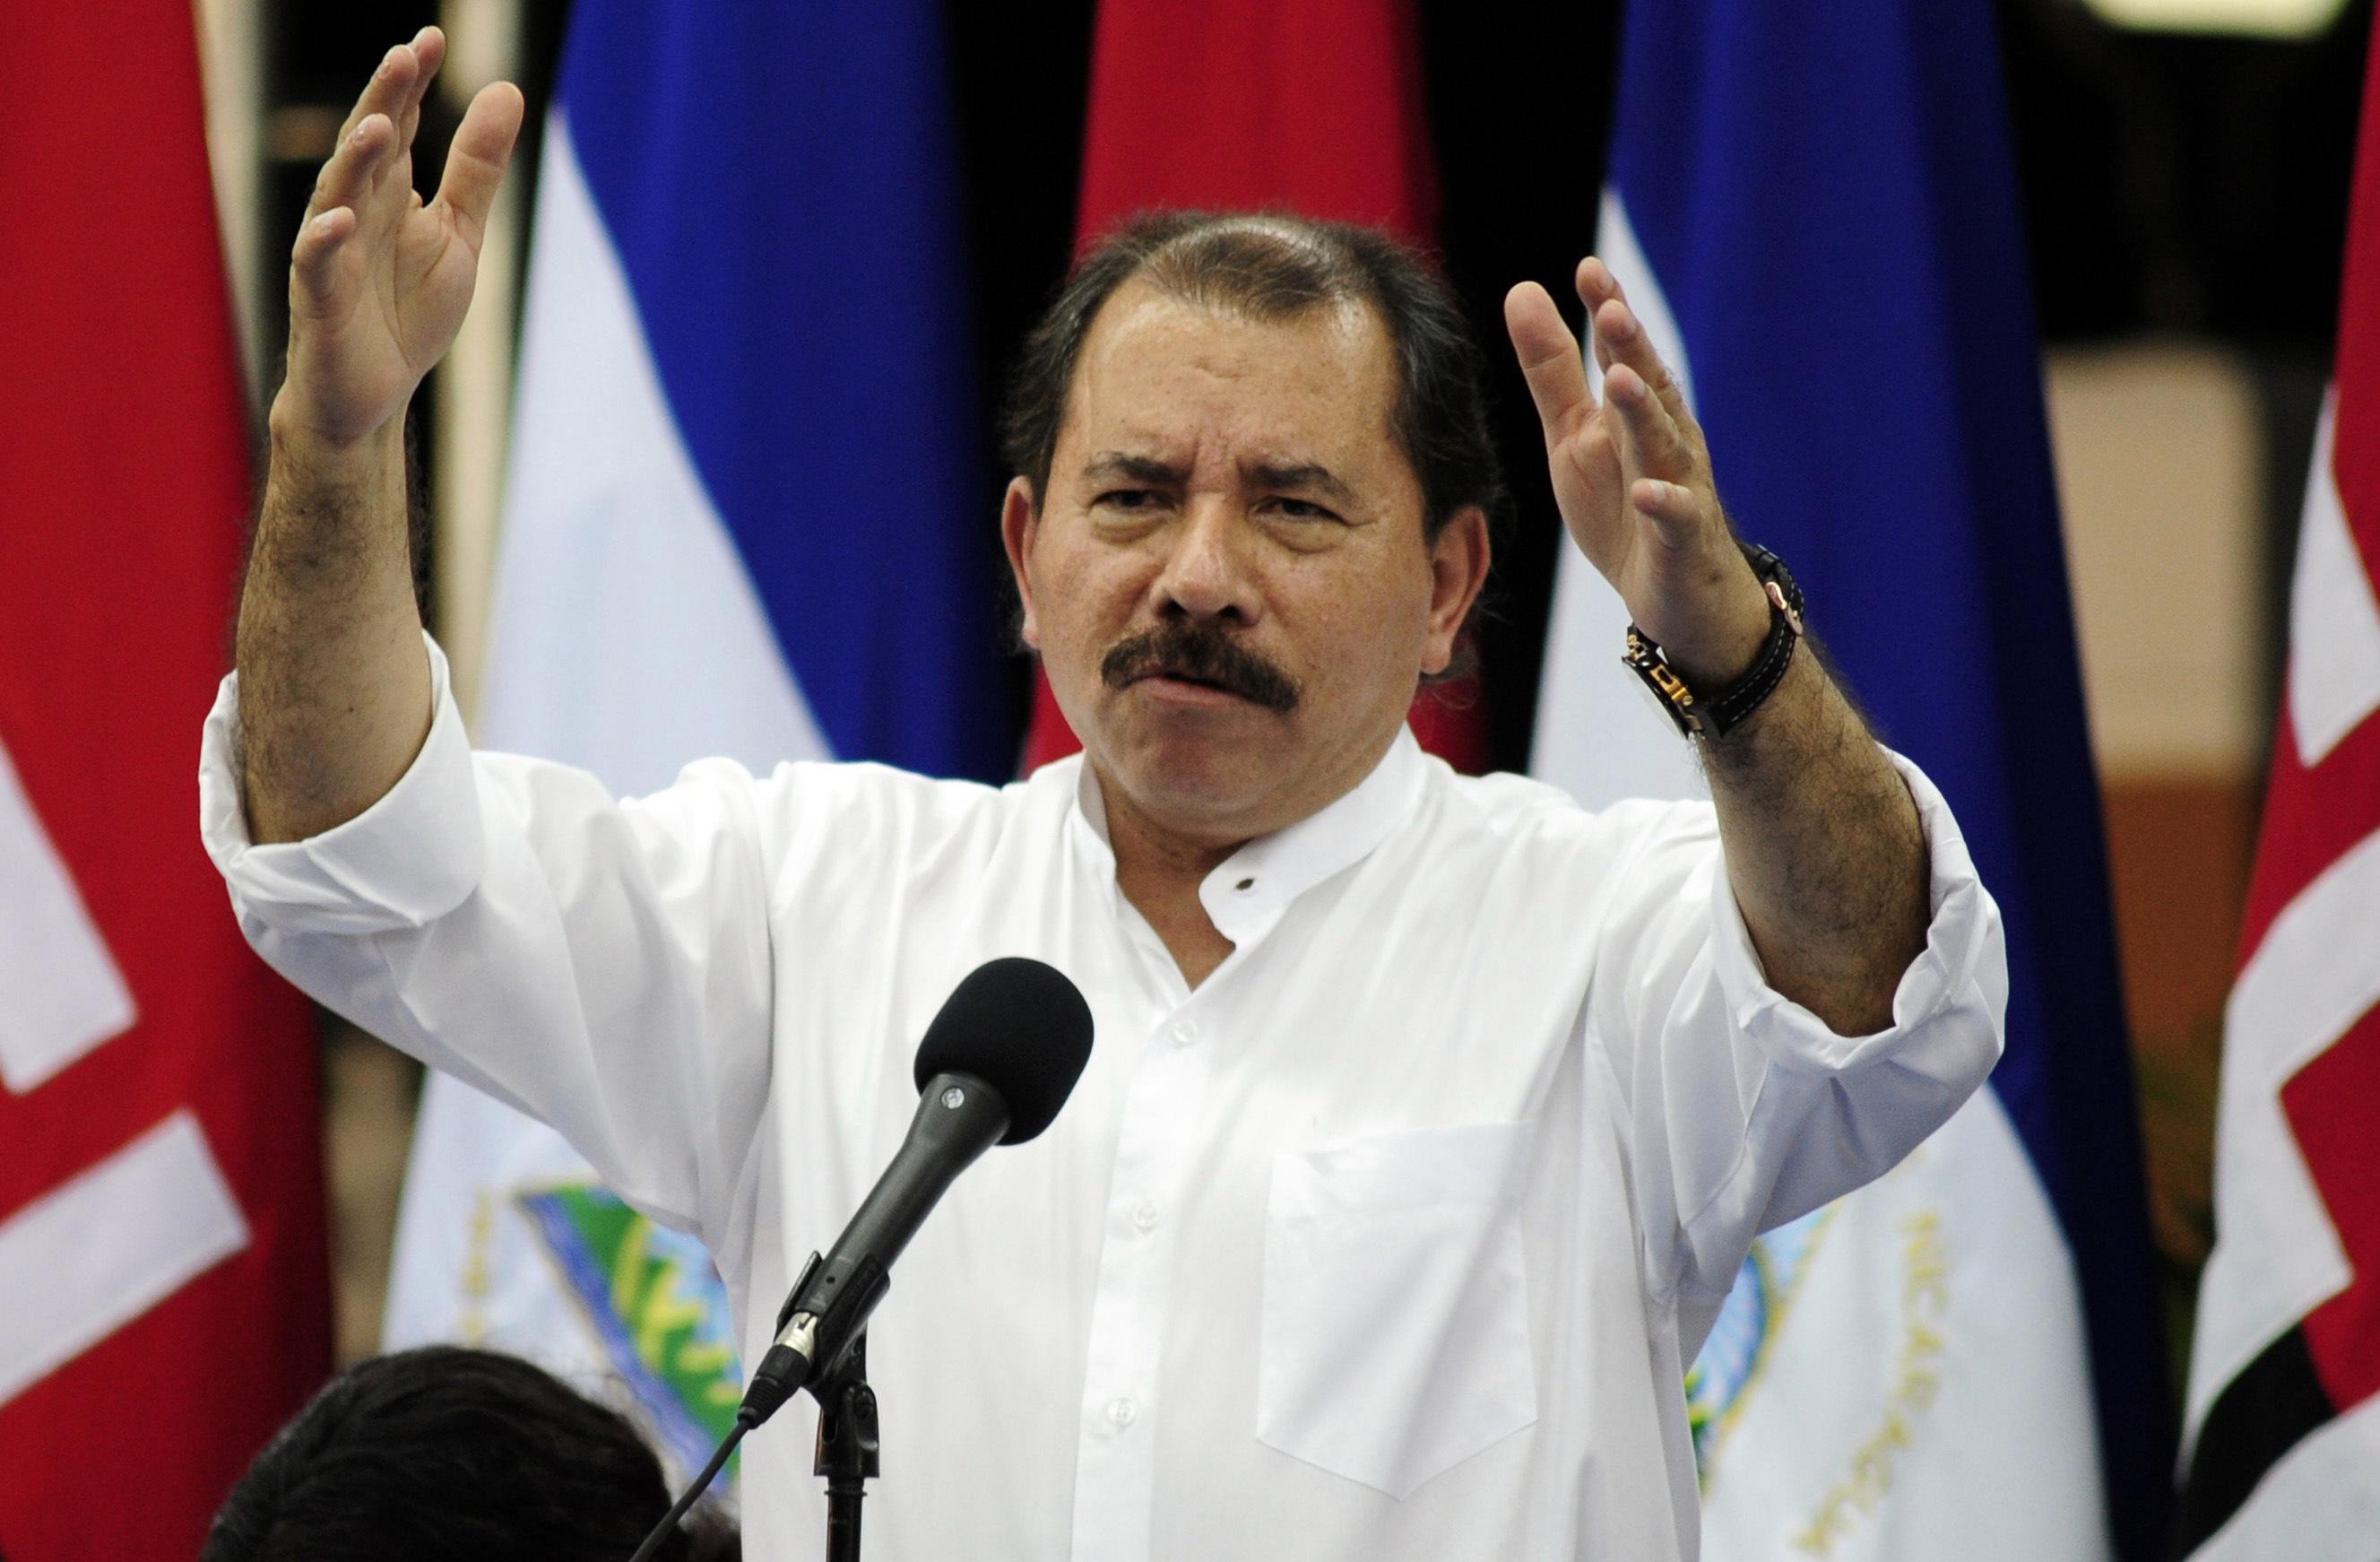 president daniel ortegas government - HD2655×1742